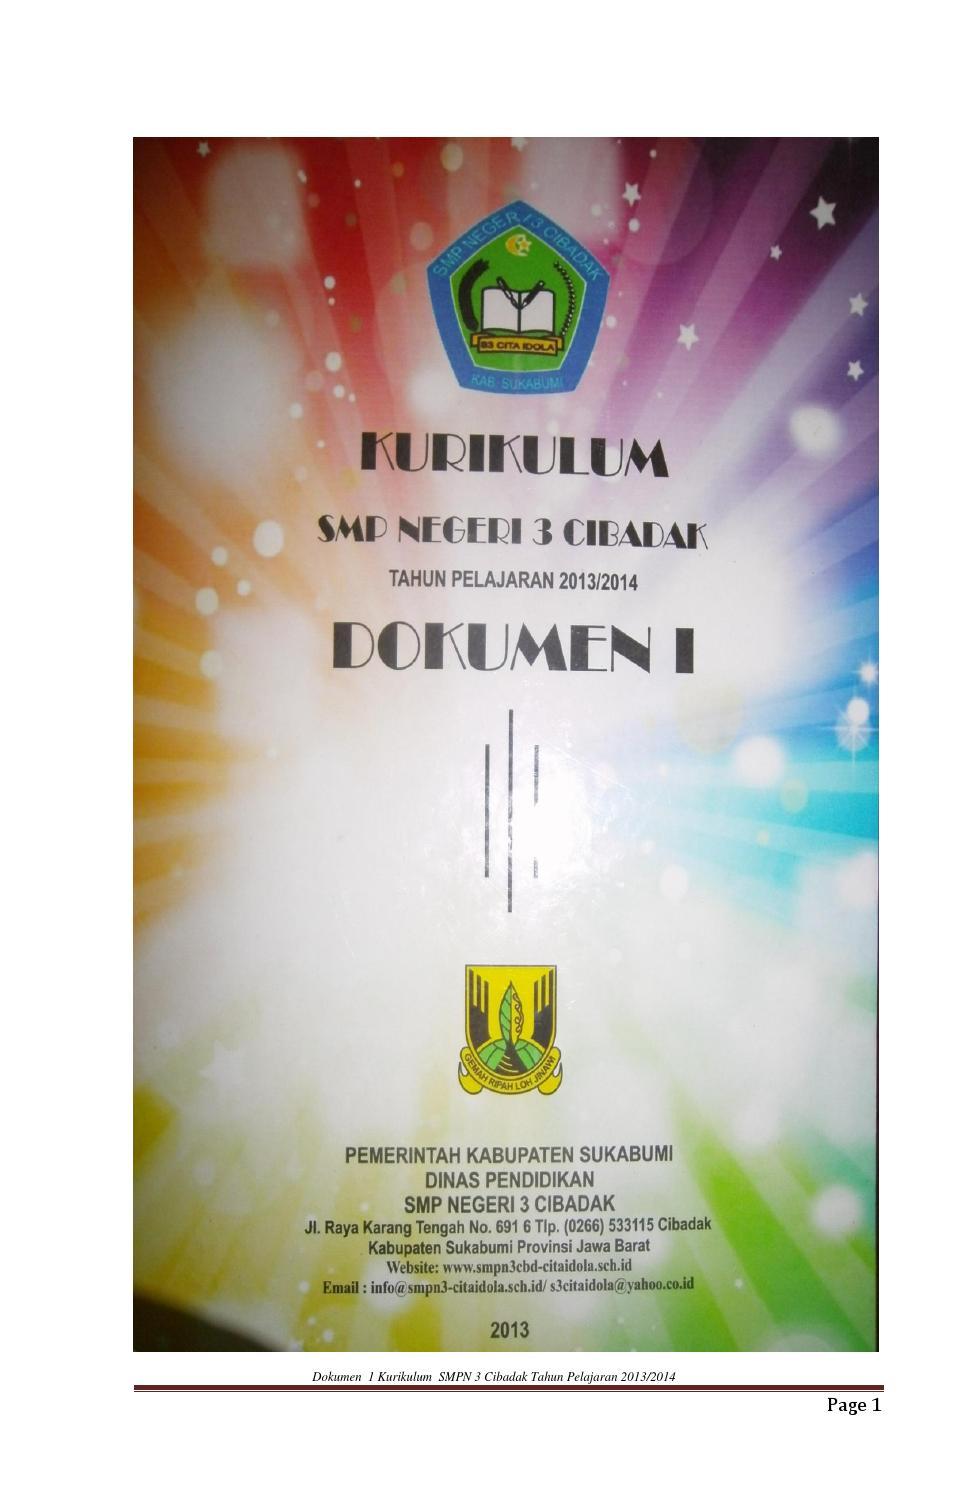 Dokumen 1 Kurikulum 2013 Sma : dokumen, kurikulum, Dokumen, Cibadak, Revisi, Vebuka.com